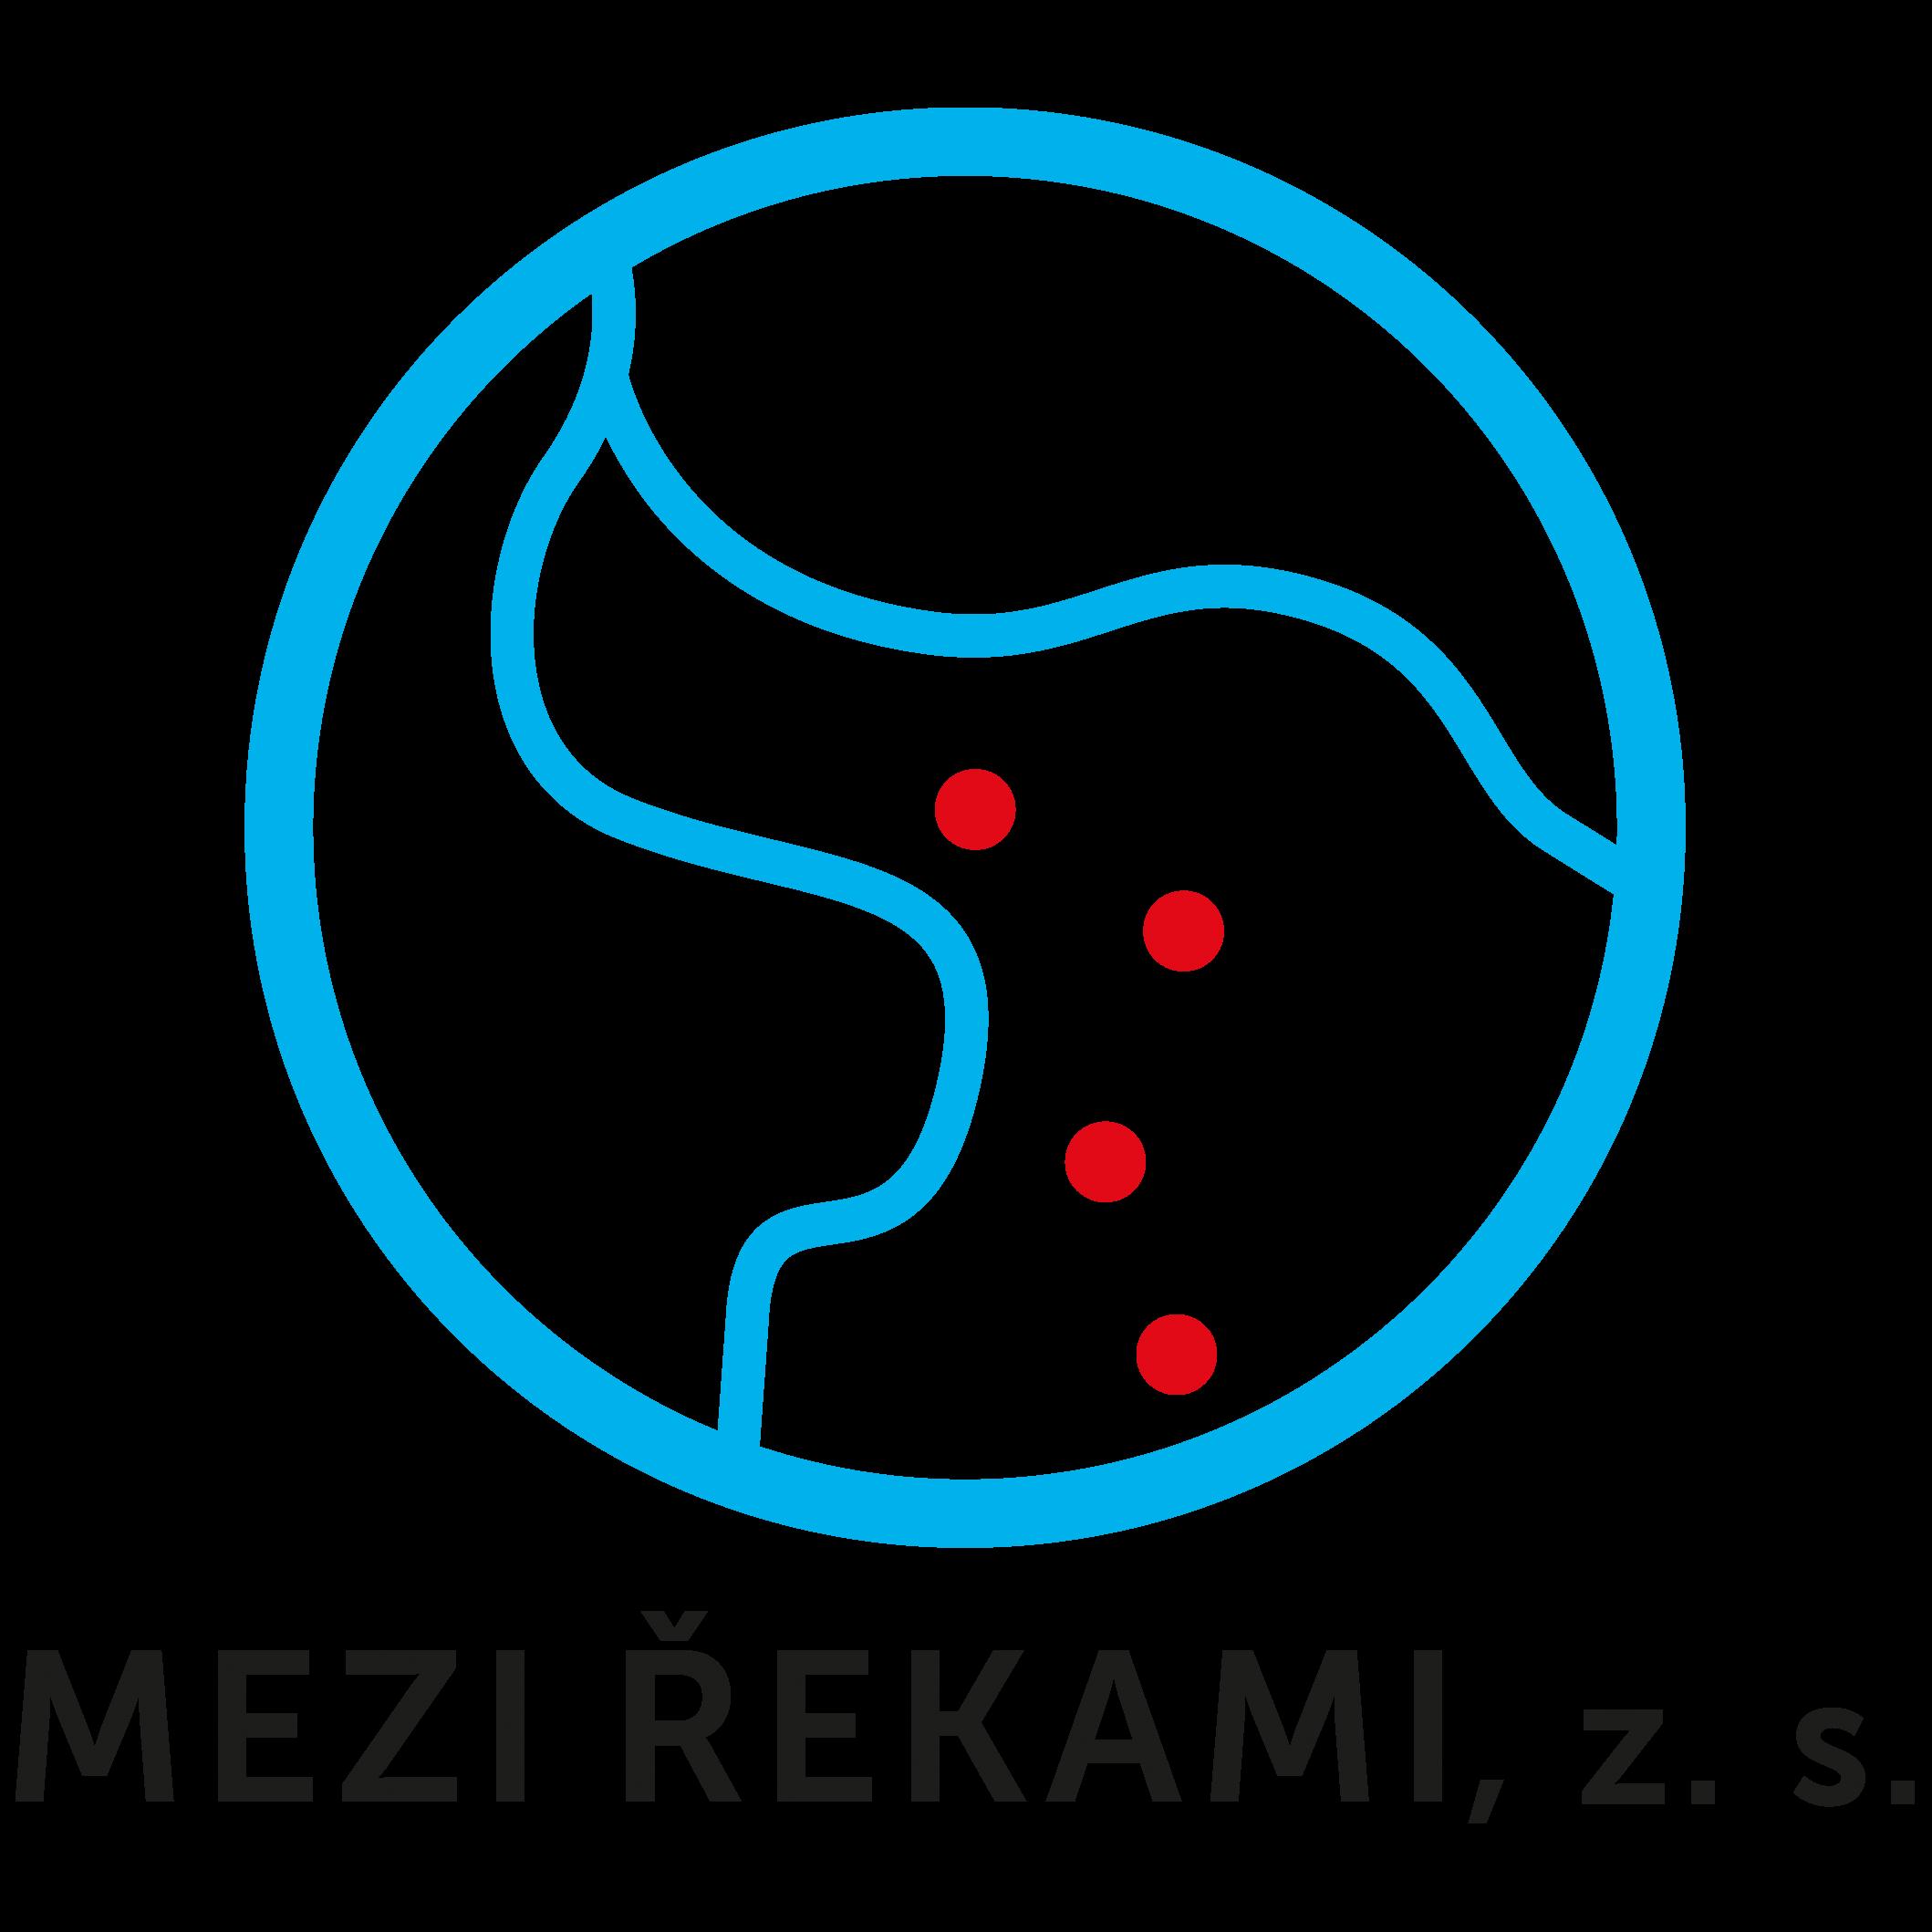 Meziřekami.cz